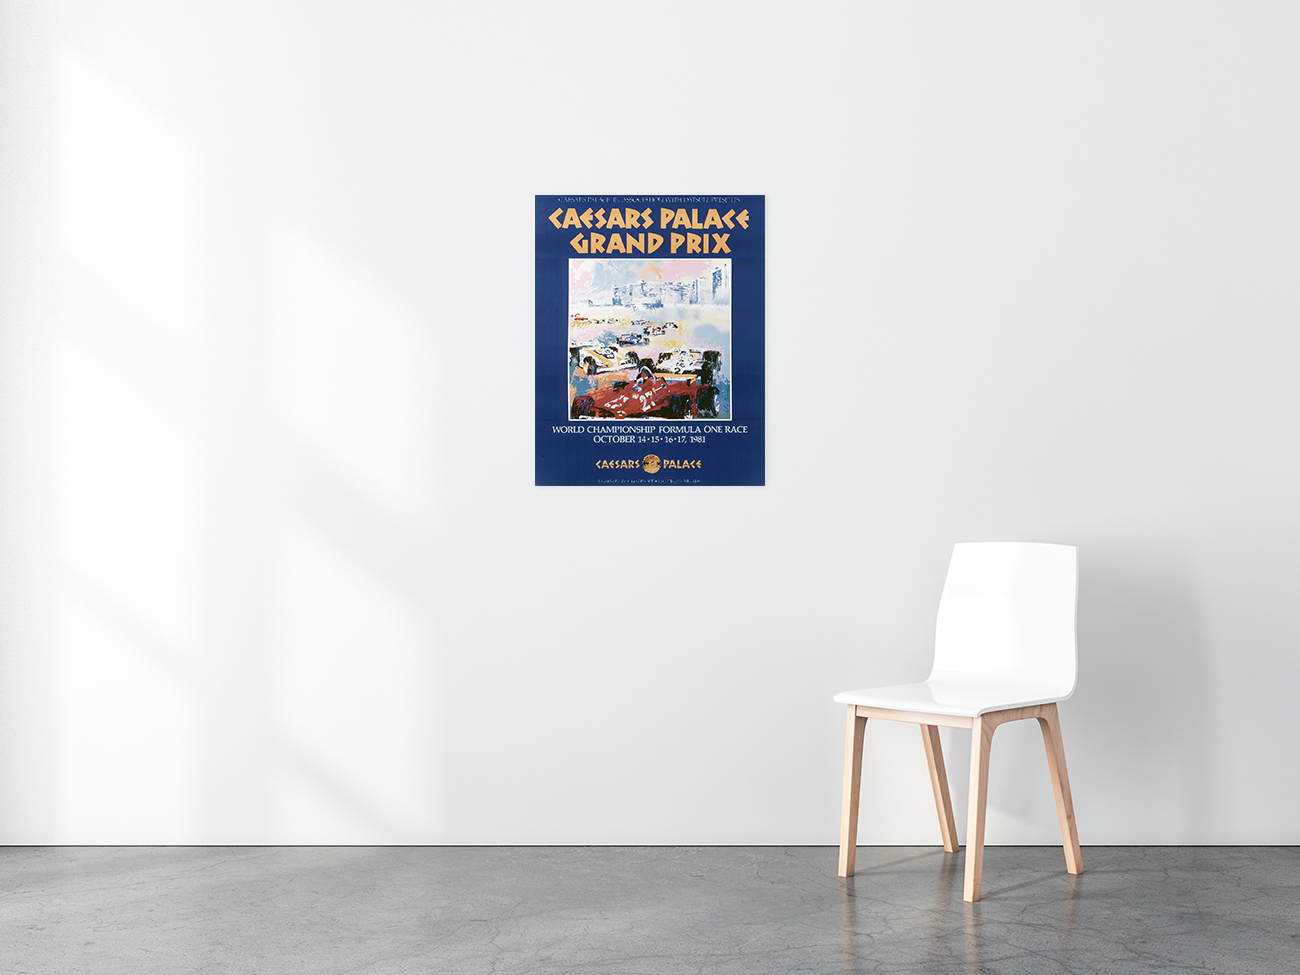 Cesar's Palace Grand Prix poster in situ